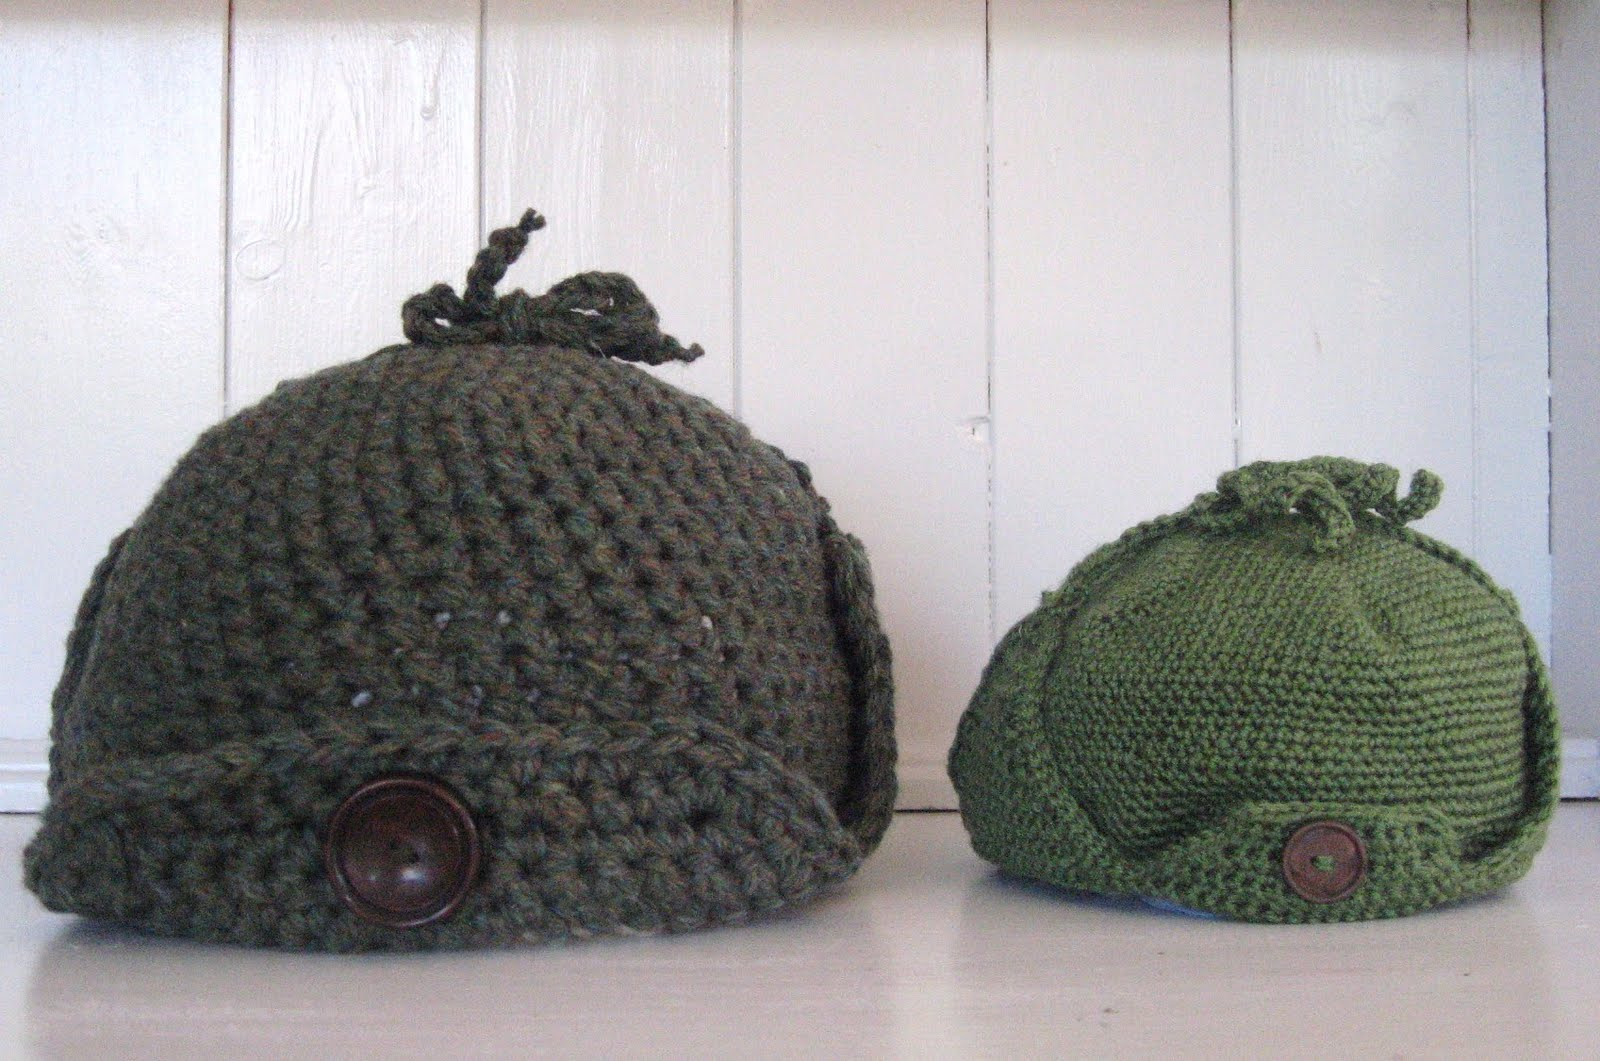 Crochet Deerstalker Hat Pattern : Northern Hi-lights: Hats, Hats and more Hats!